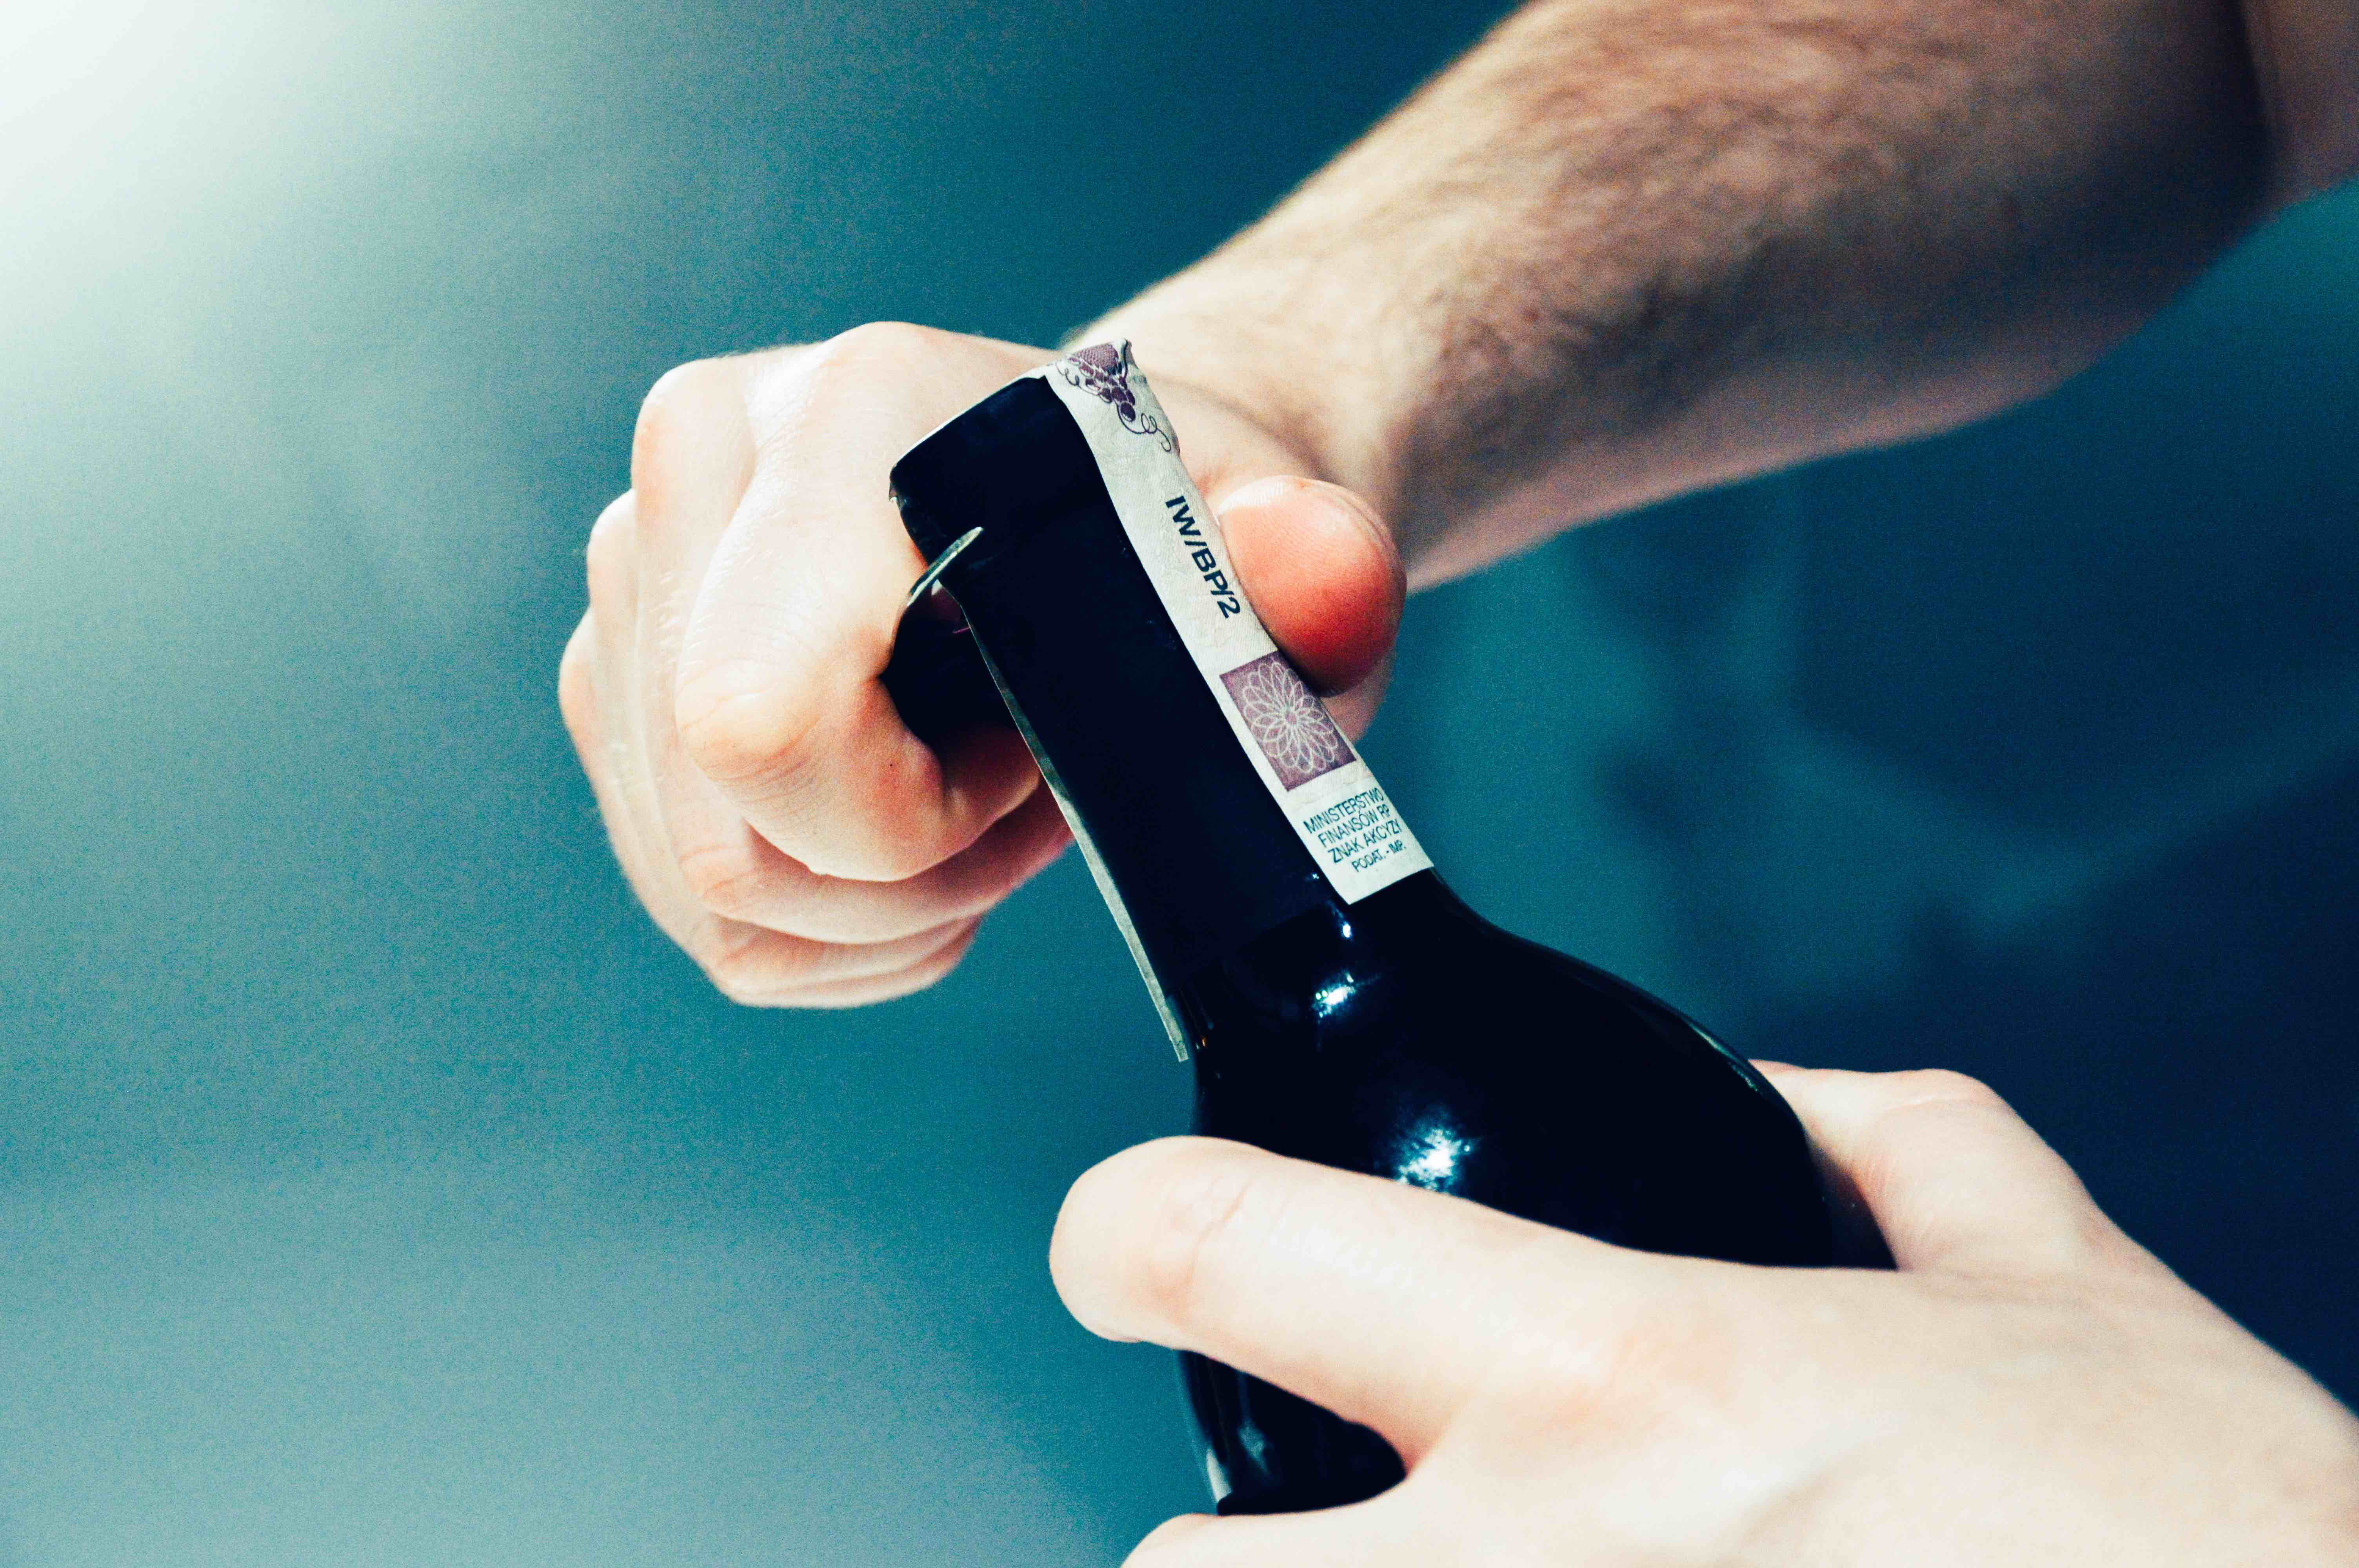 Training your staff on wine